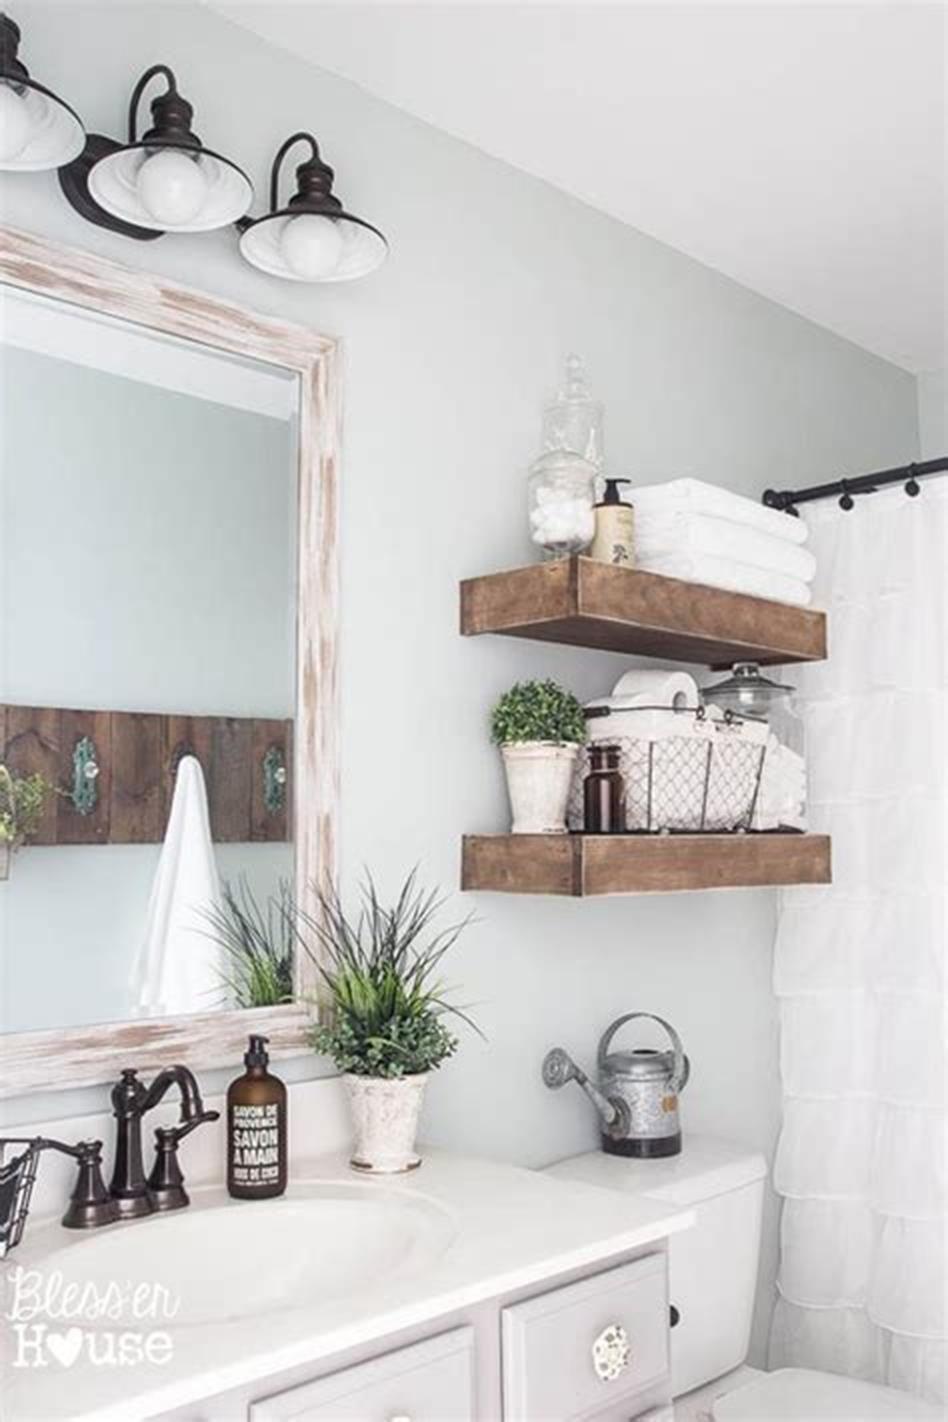 50+ Best Modern Country Bathroom Design and Decor Ideas ...